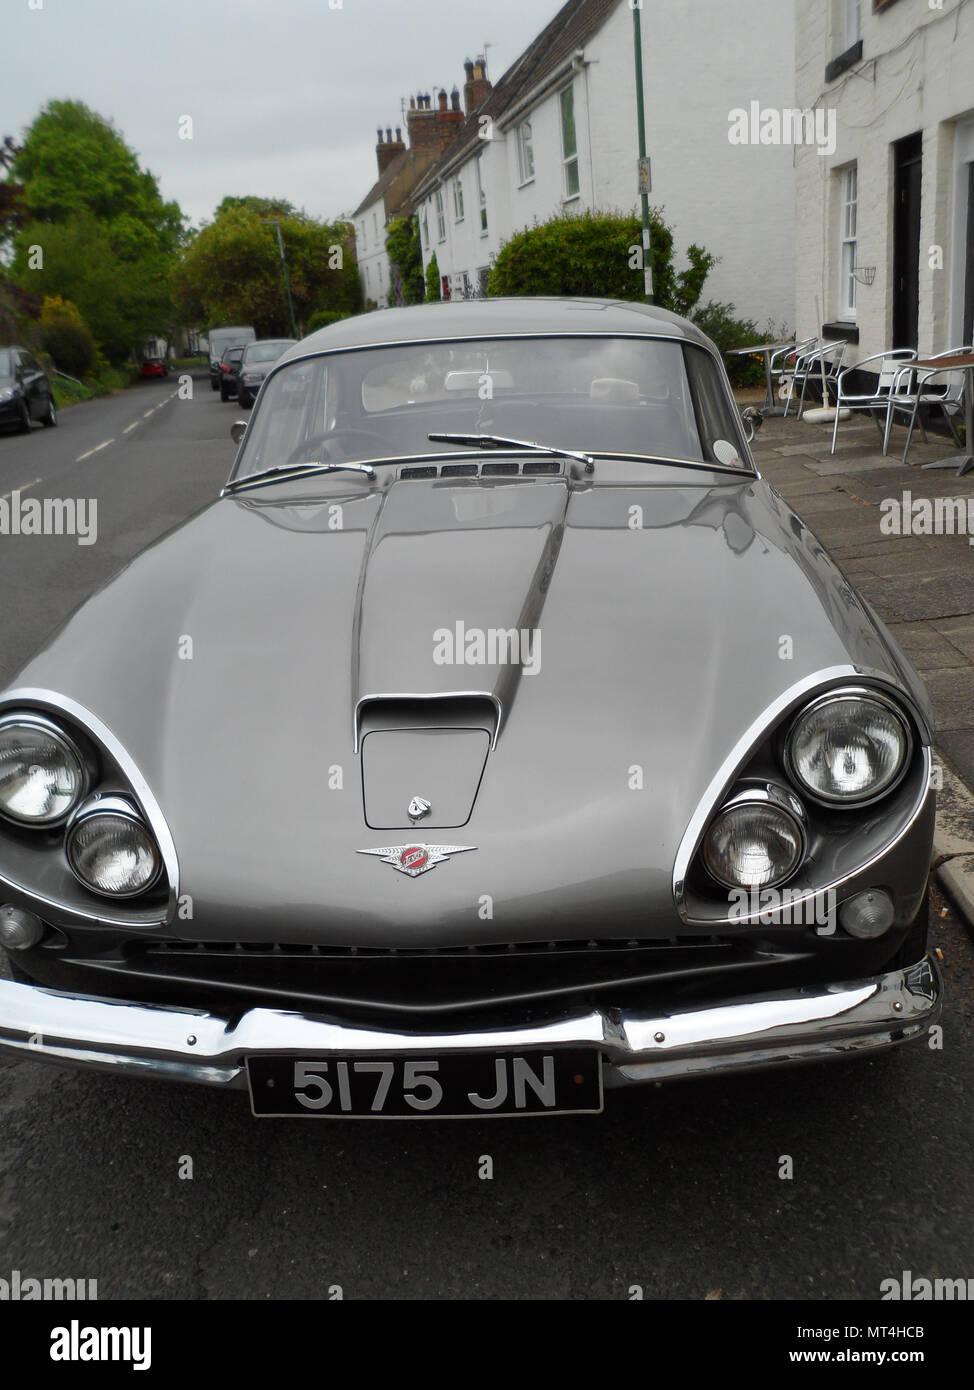 British built Jensen CV-8 sports 2 door coupe classic car. - Stock Image